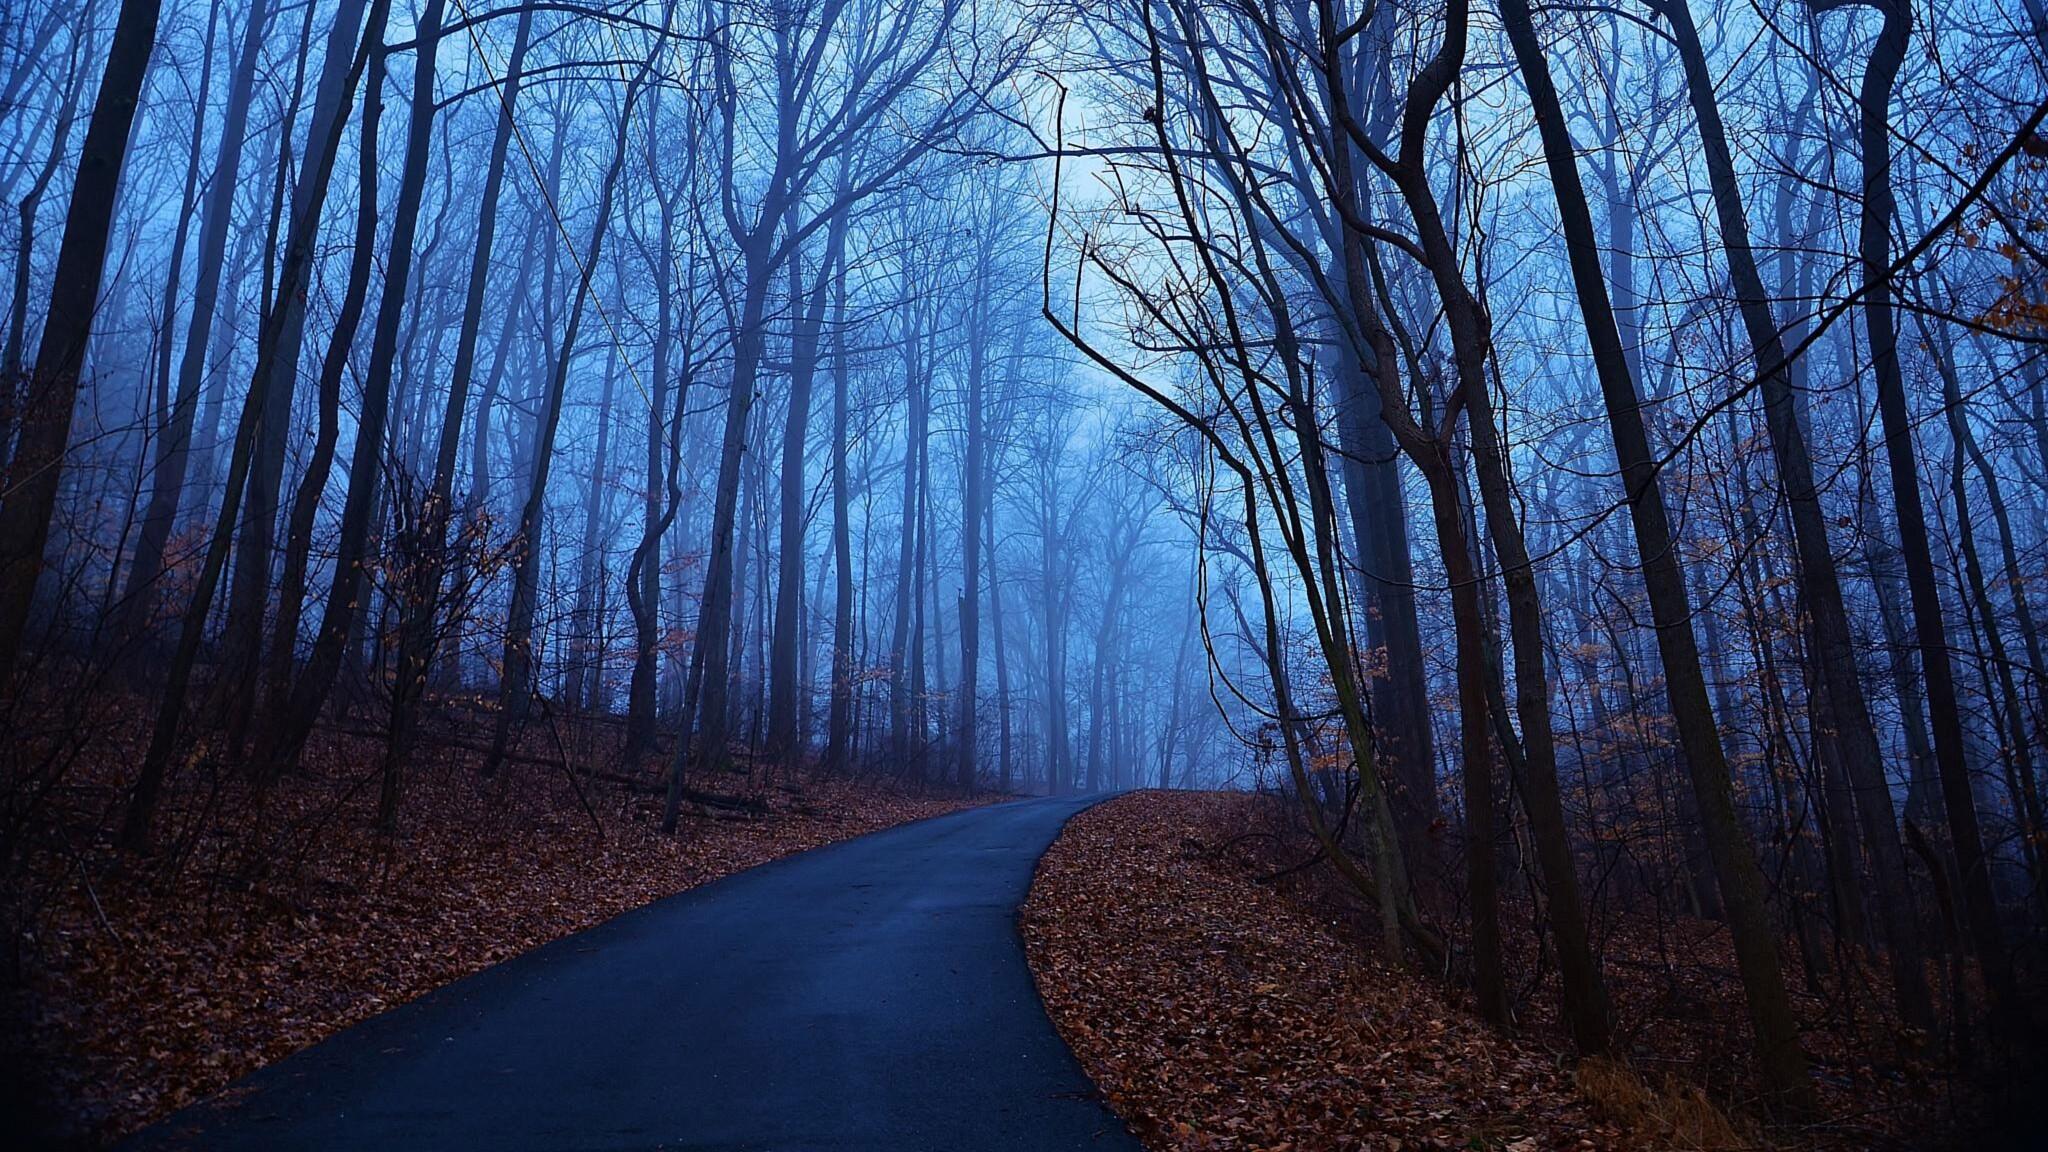 blue road nature photo - photo #7